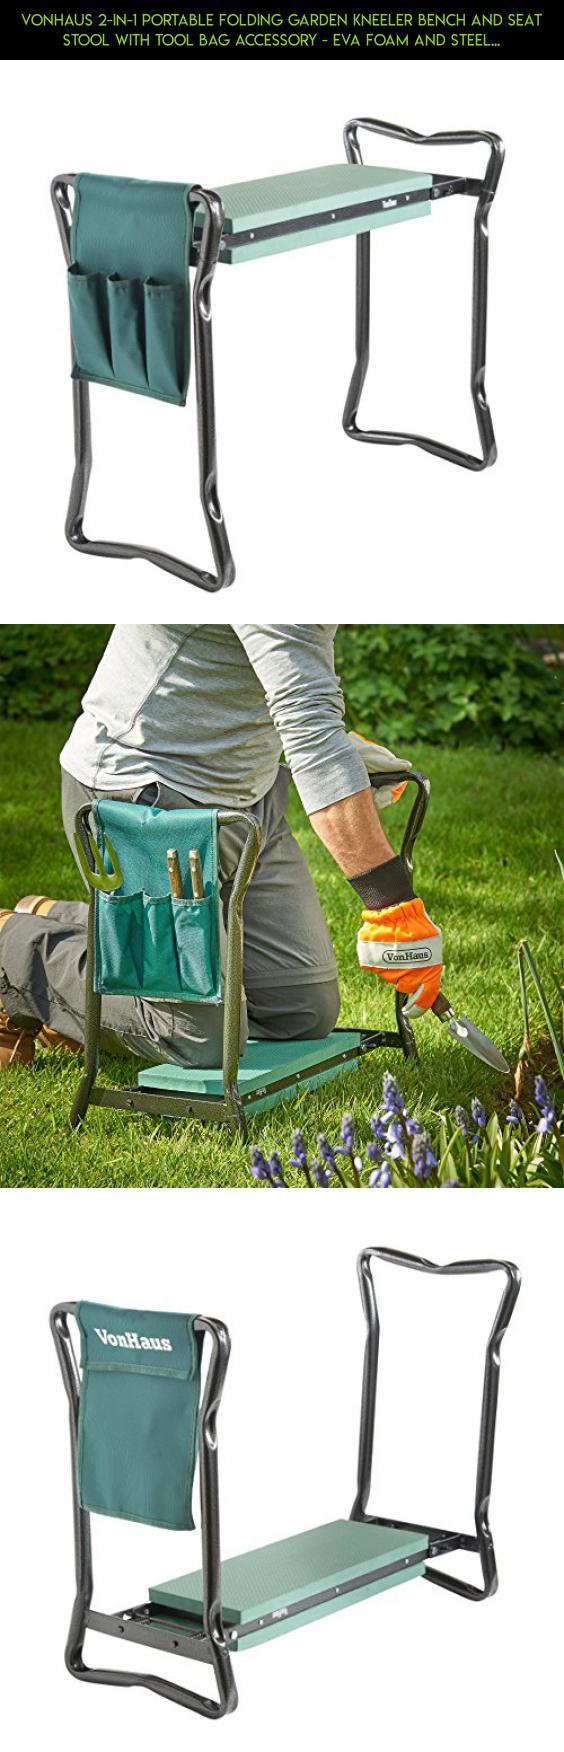 watch stool gardening garden ergonomic youtube